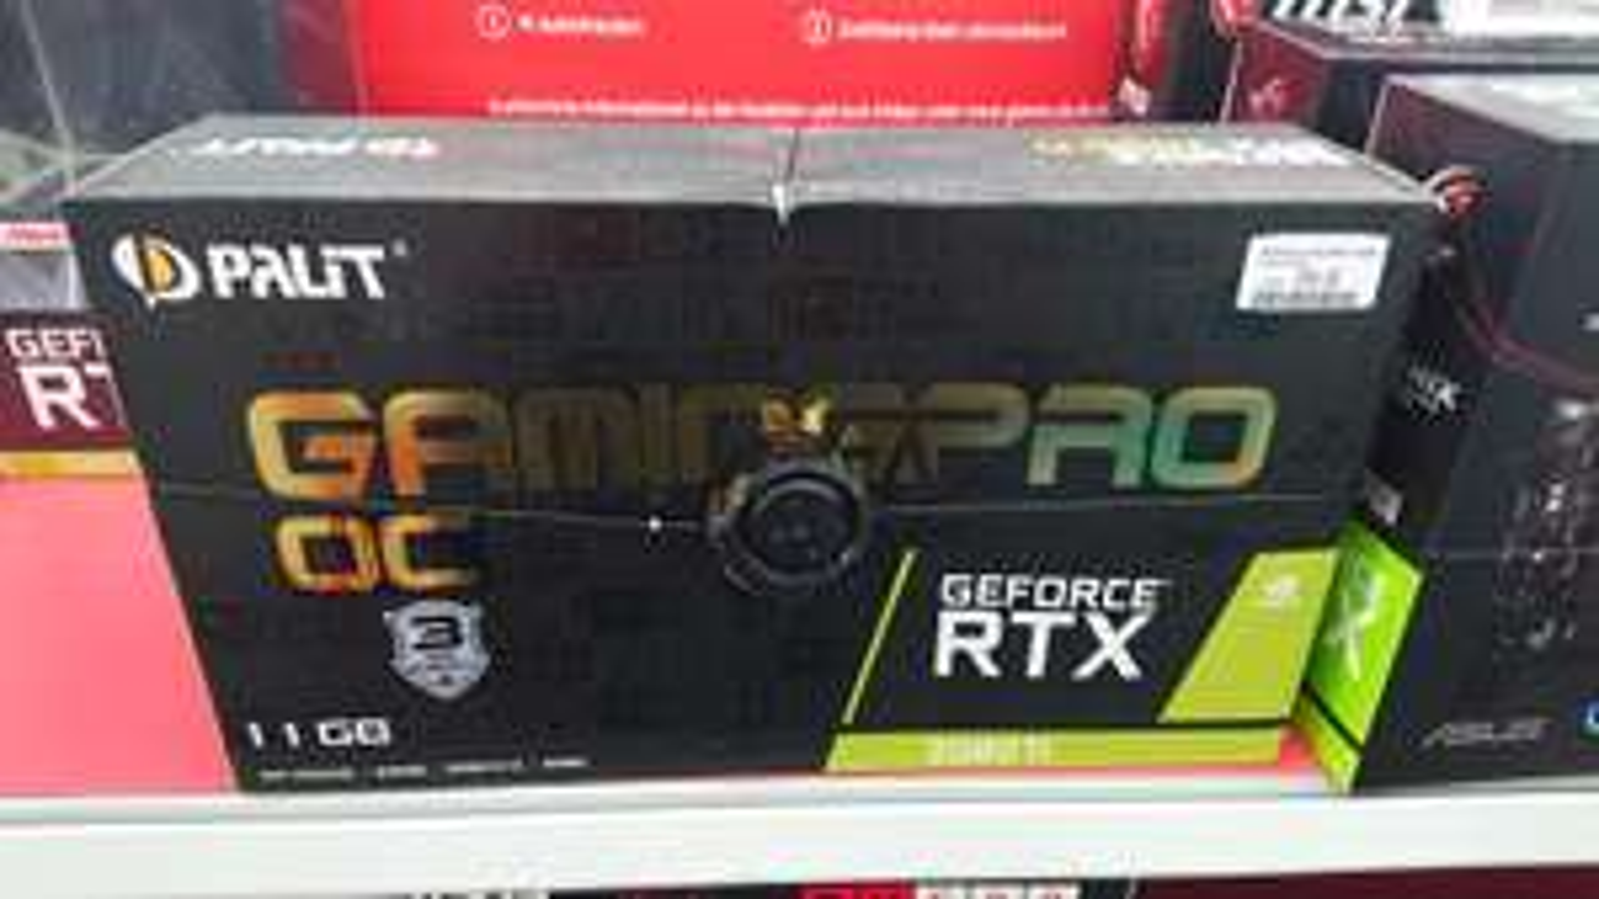 [LOKAL Media Markt Weiterstadt] Palit GeForce RTX 2080 Ti GamingPro OC, 11GB GDDR6 (NE6208TS20LC-150A)